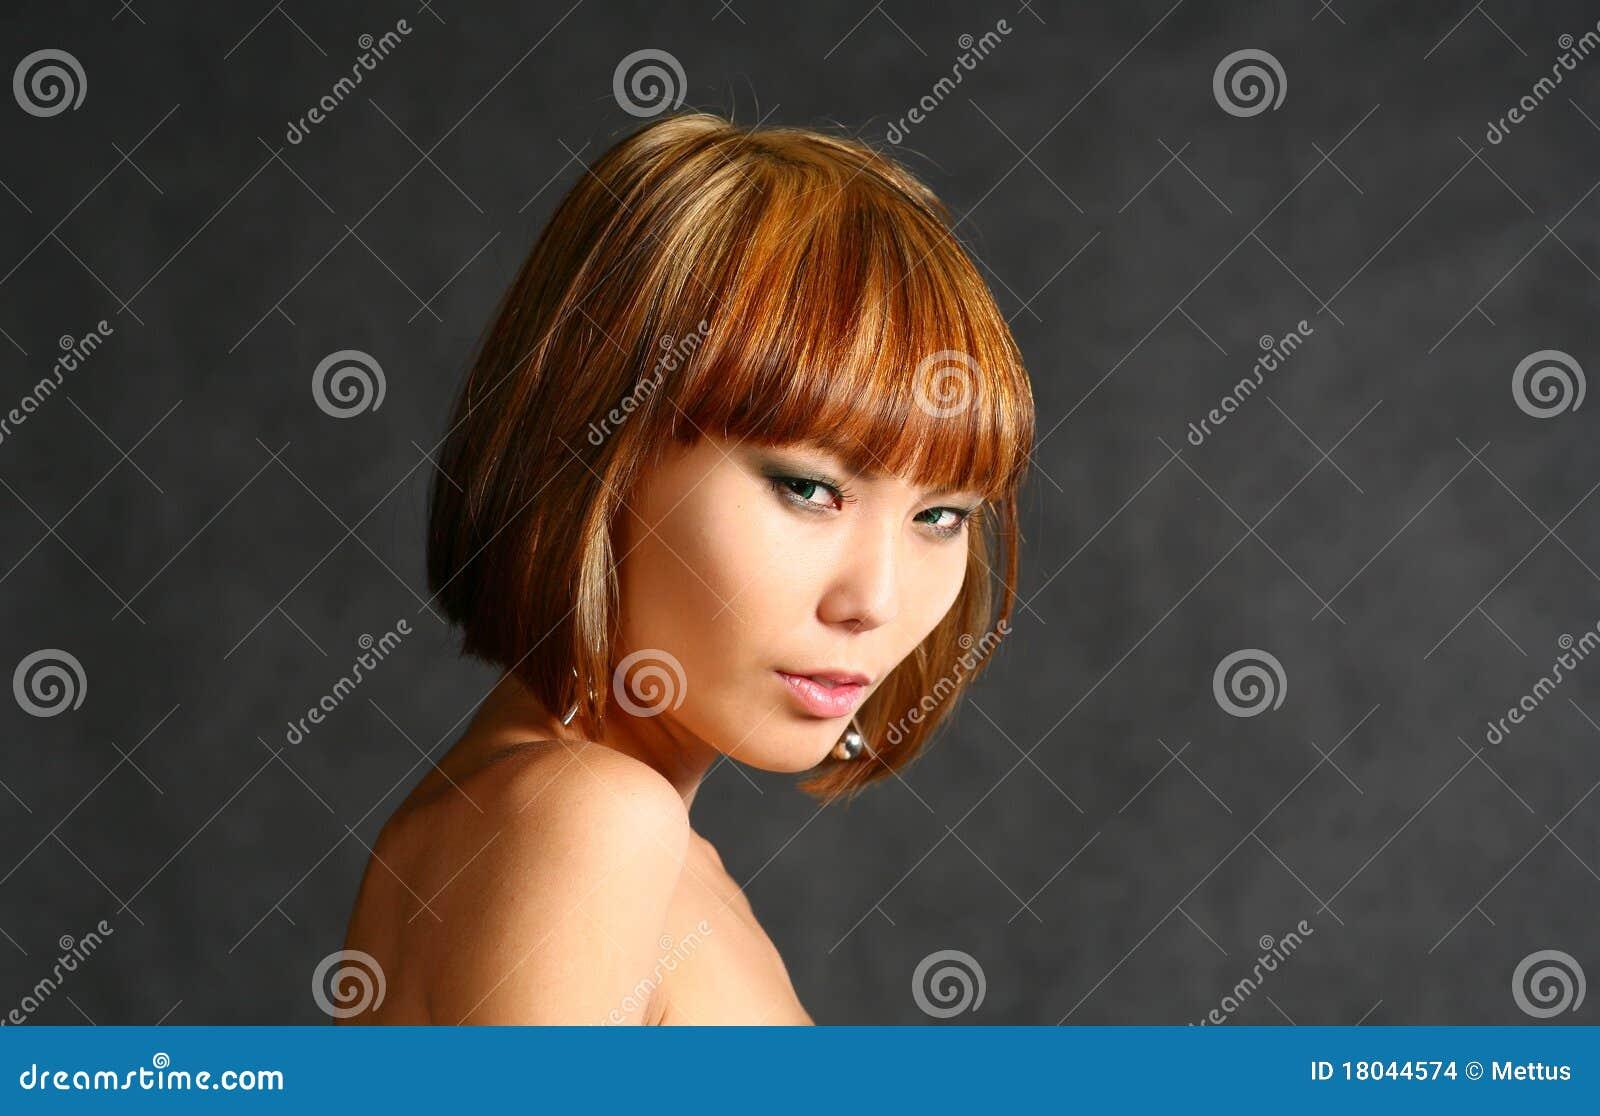 beautiful japanese girl stock photo. image of asia, model - 18044574